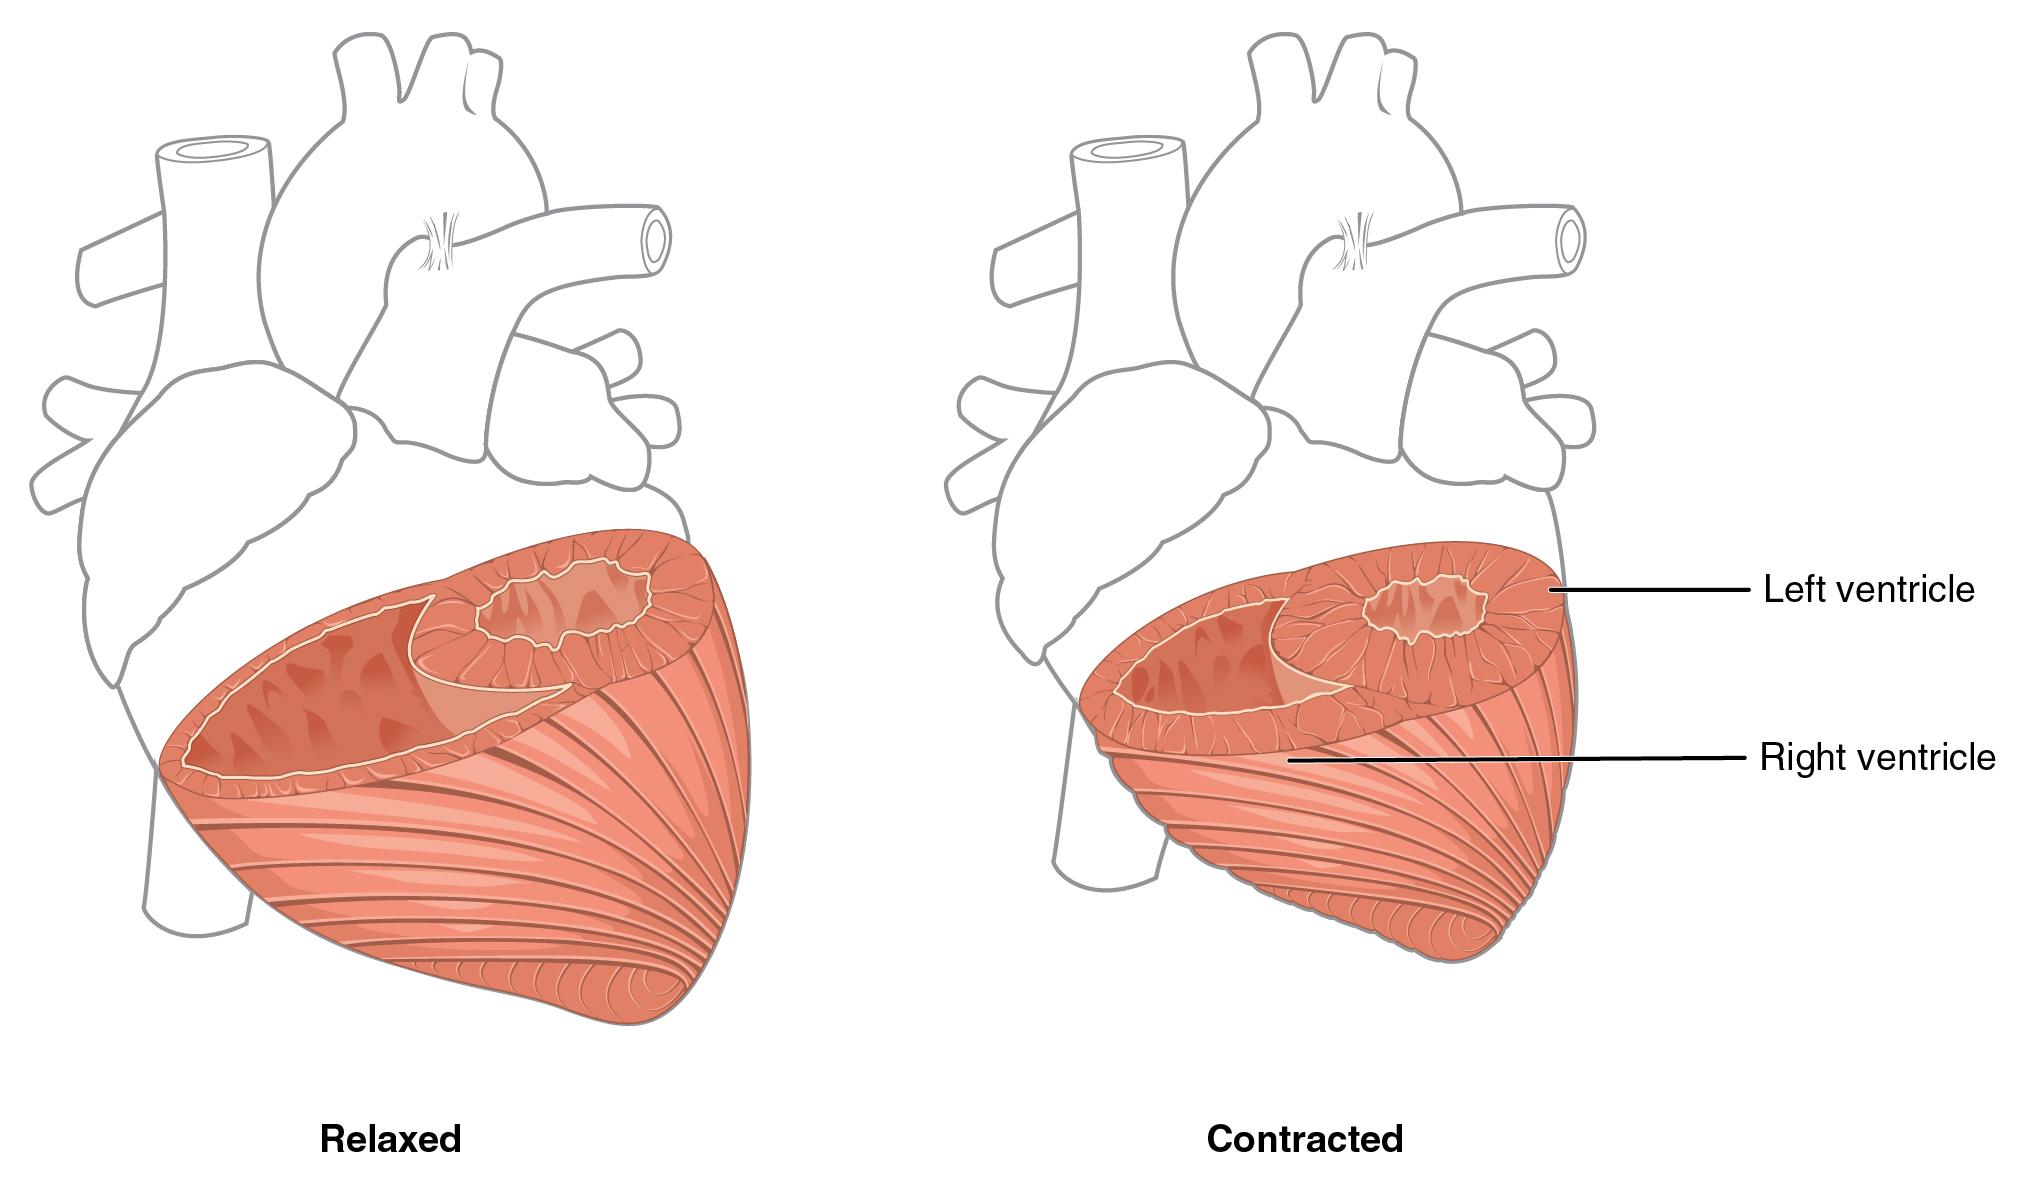 19 1 Heart Anatomy Anatomy And Physiology